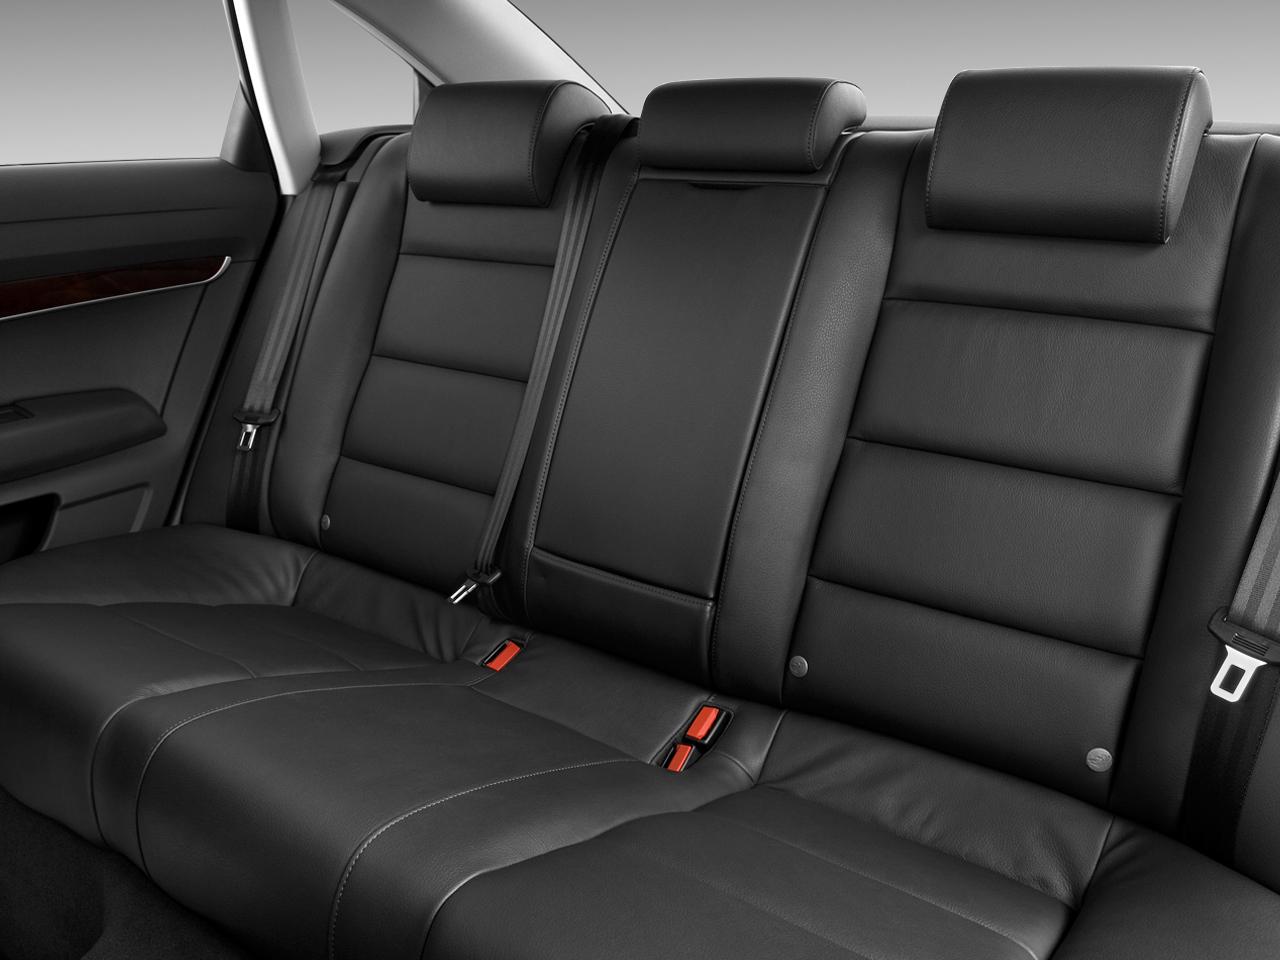 2009 audi a6 3 0t audi luxury sedan review automobile magazine. Black Bedroom Furniture Sets. Home Design Ideas